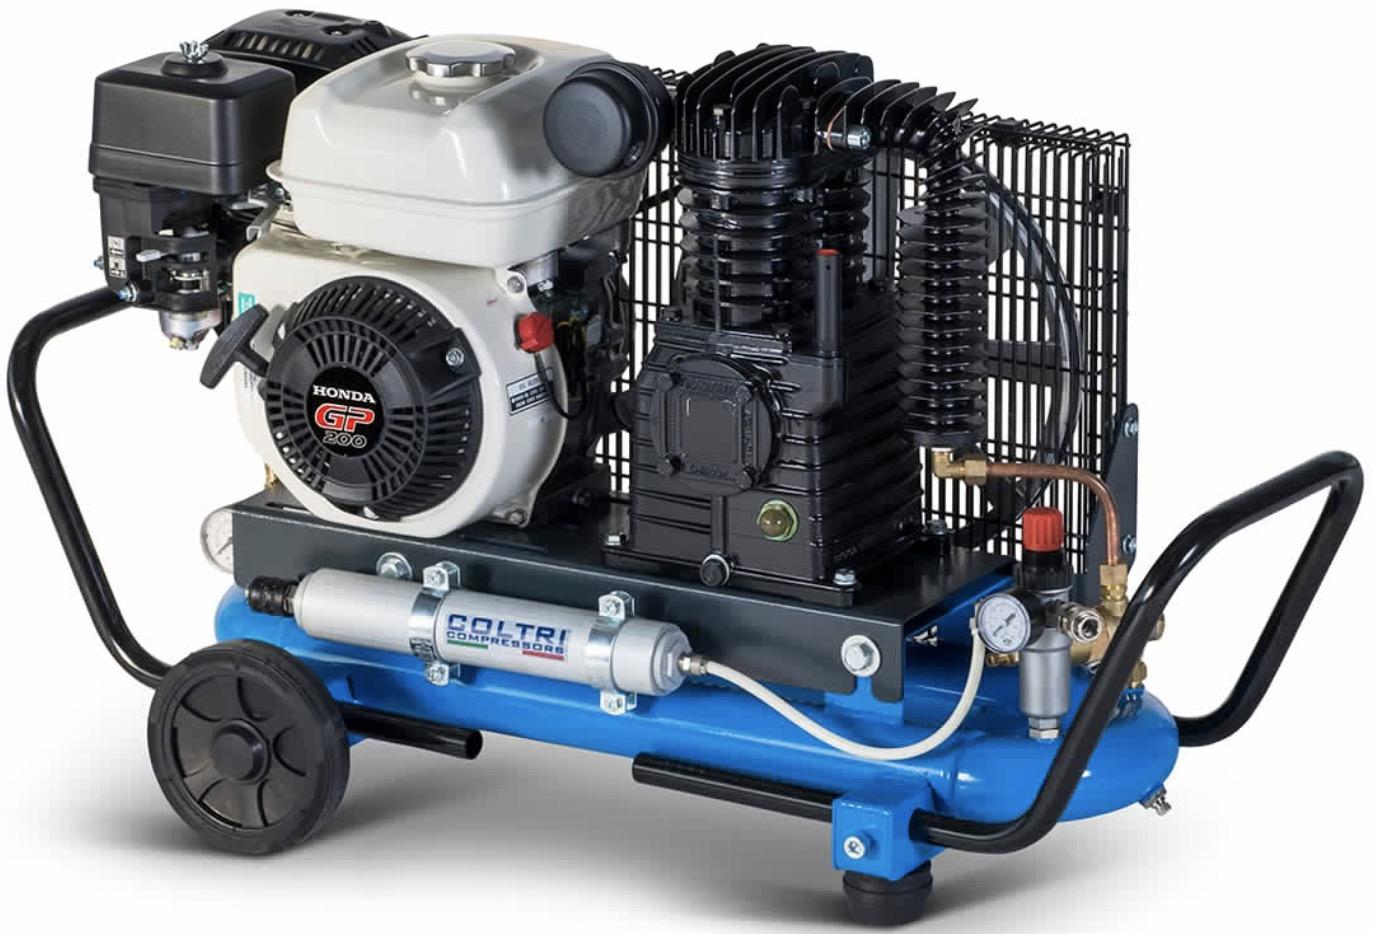 低壓壓縮機(LP Compressor)